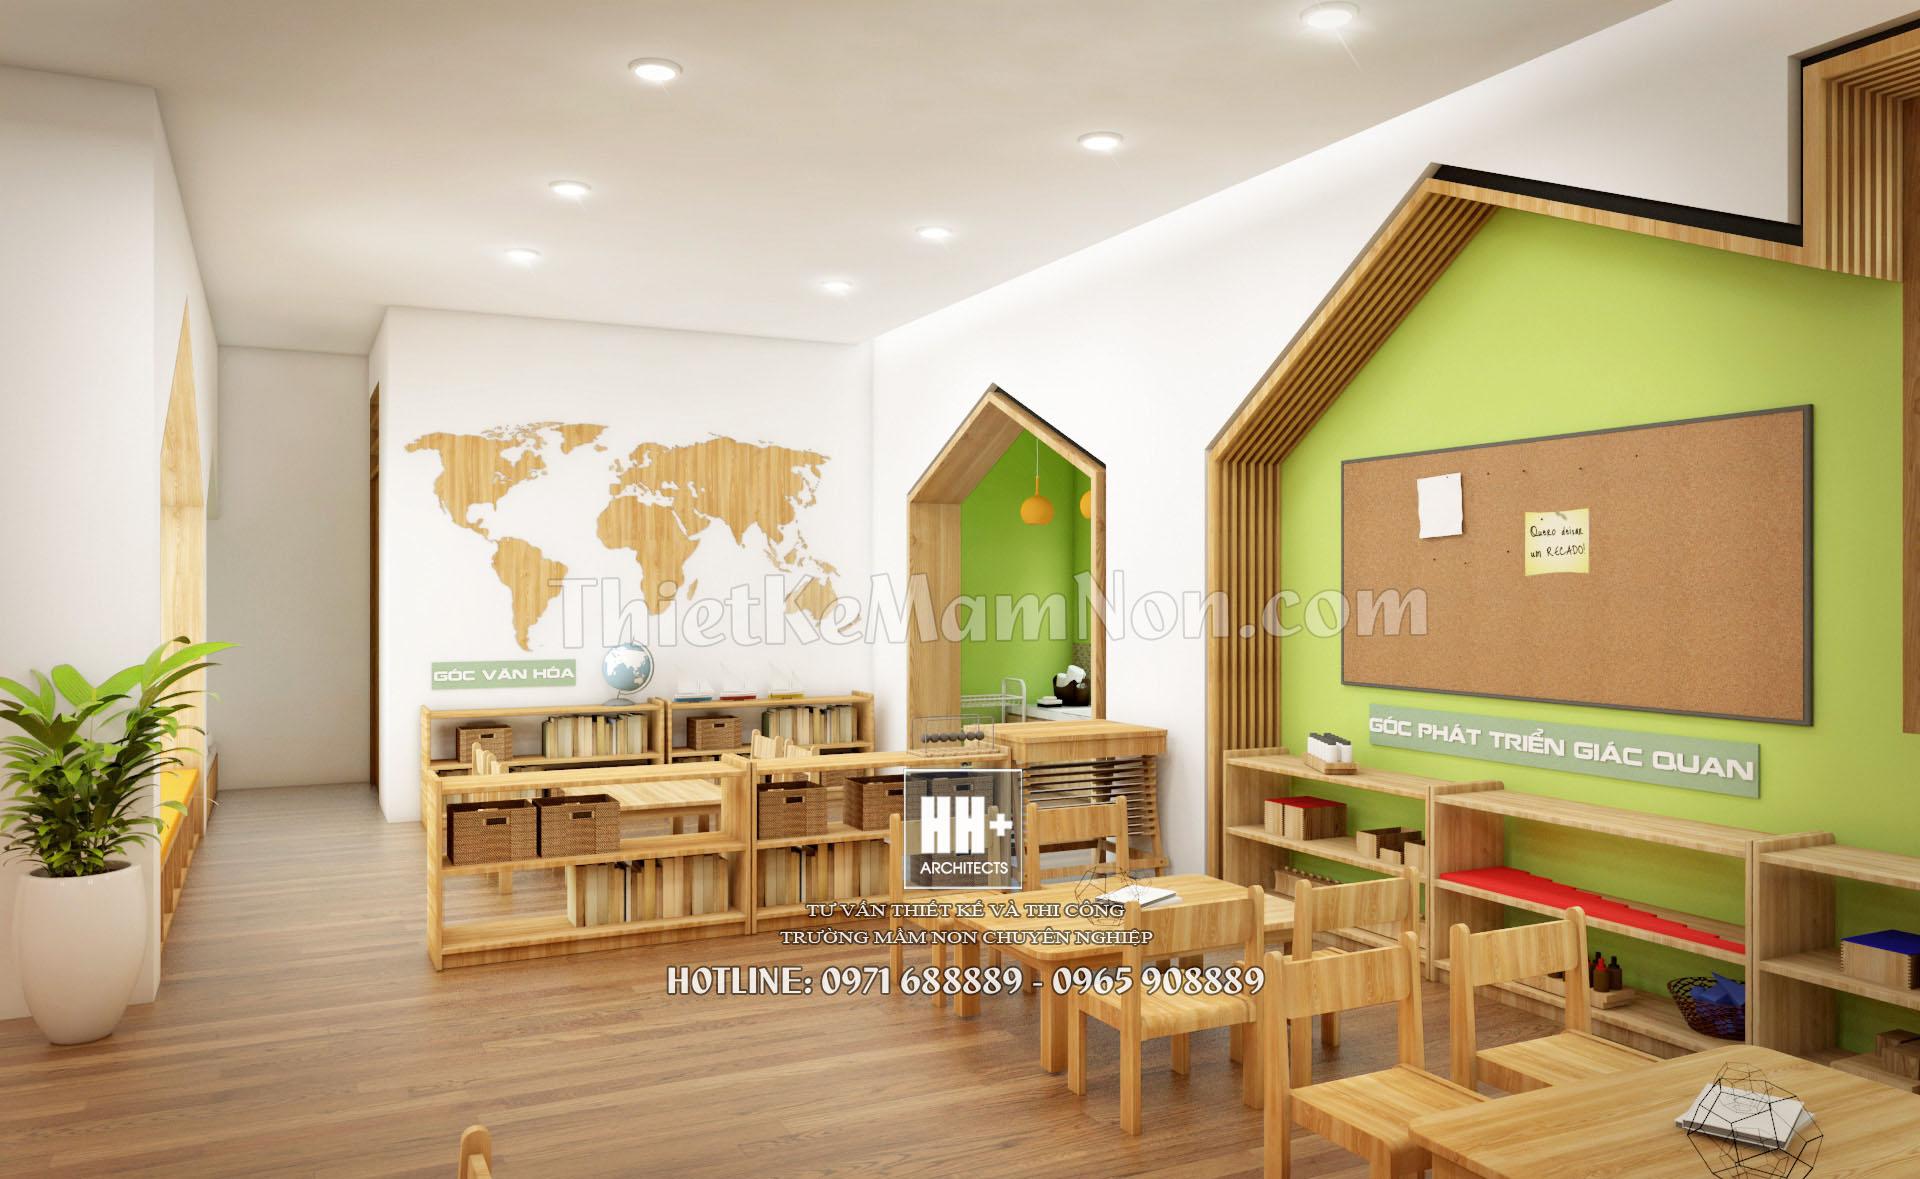 8 thiết kế trường mầm non montessori Thiết kế trường mầm non montessori Việt Anh 8 1